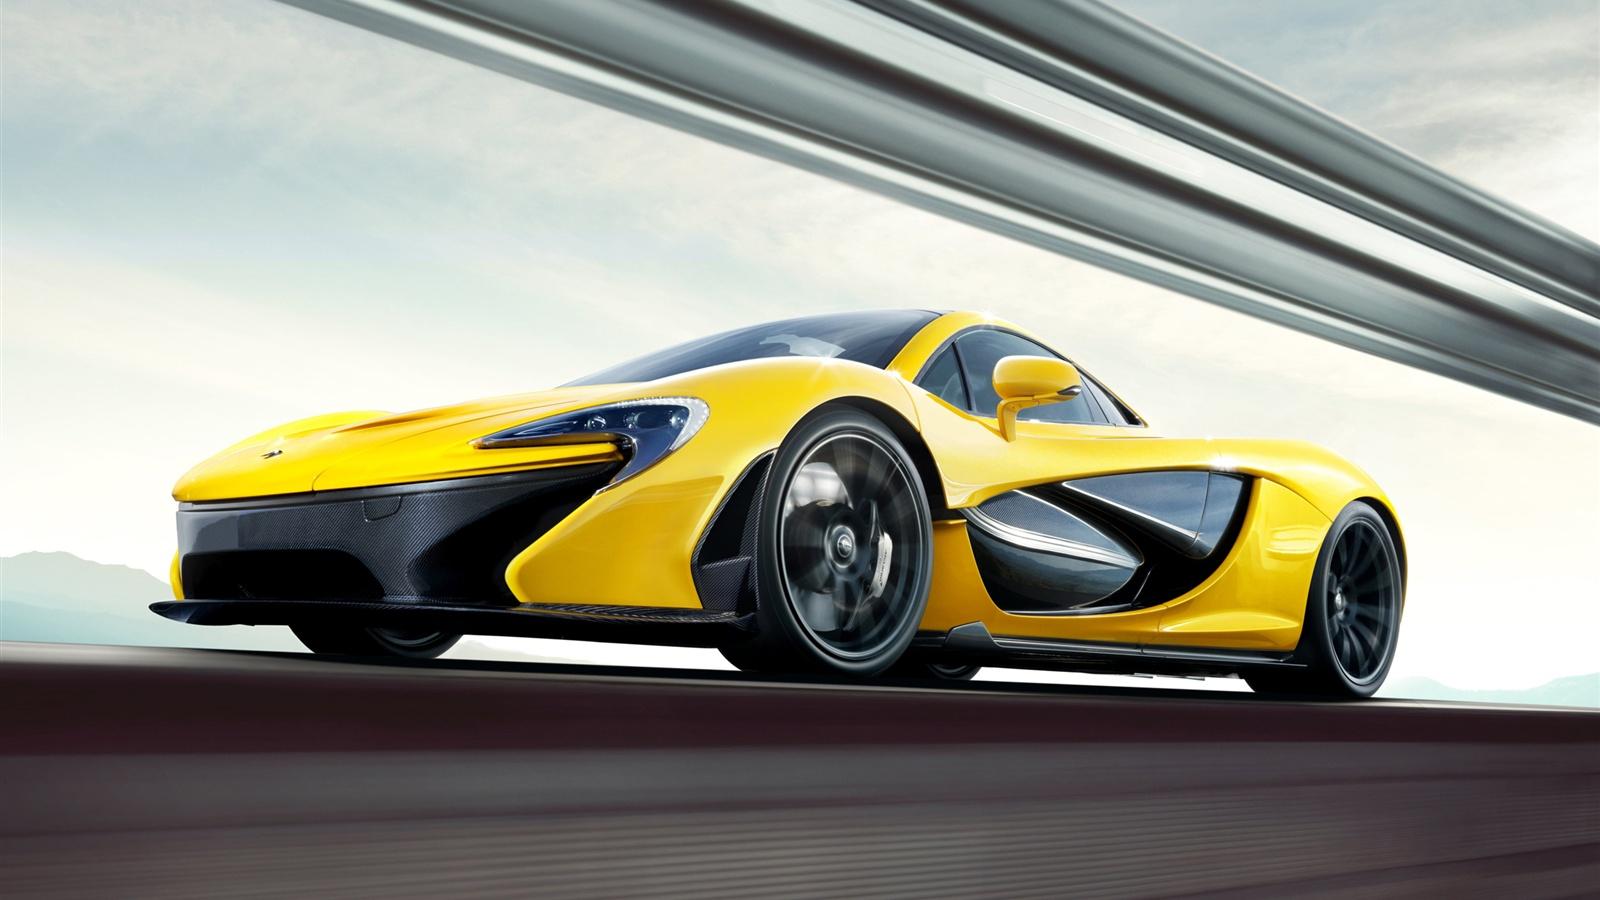 p1 jaune supercar fond...